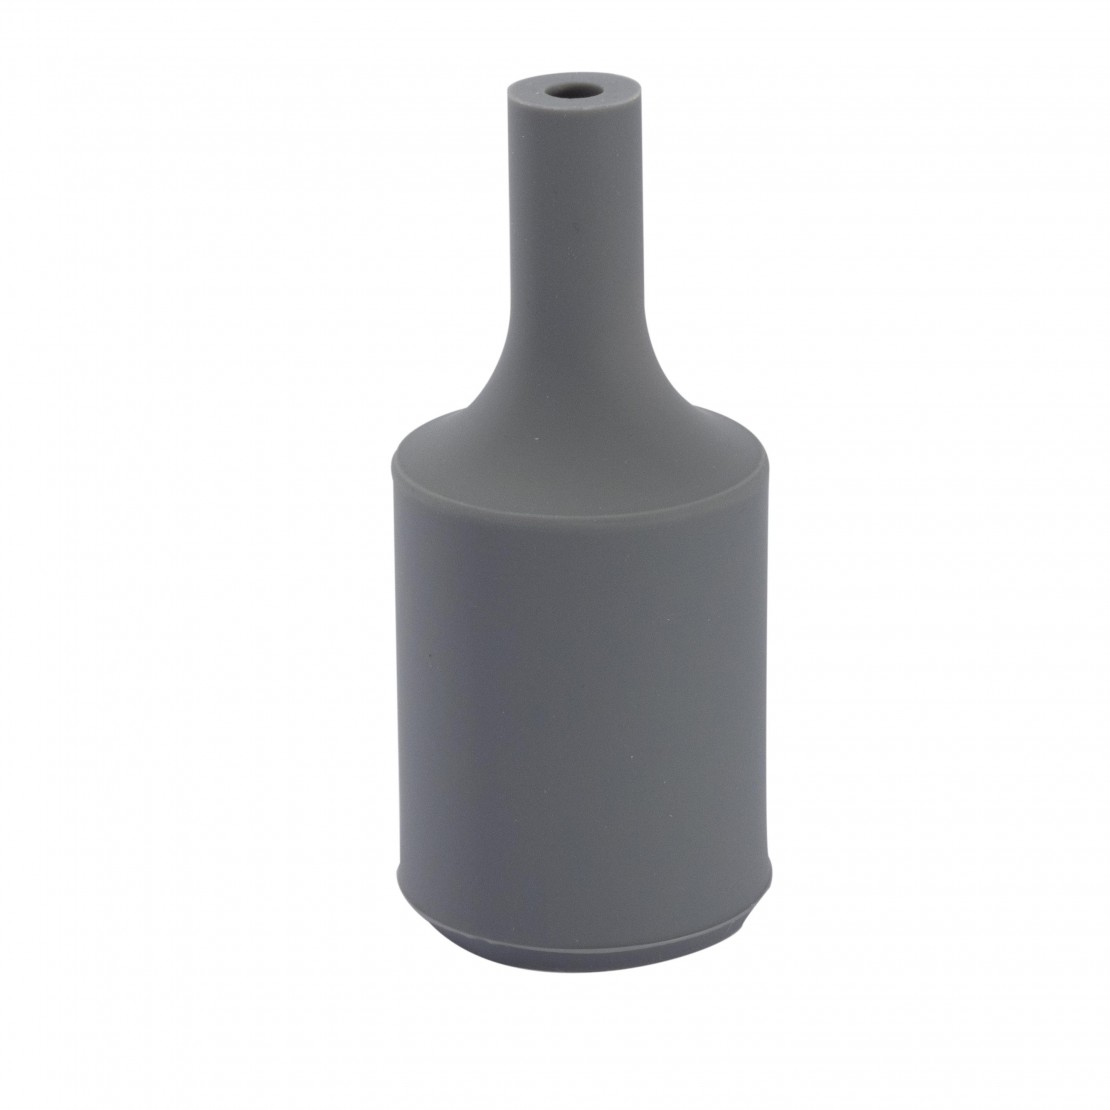 Siliconen lamphouder- clear grijs